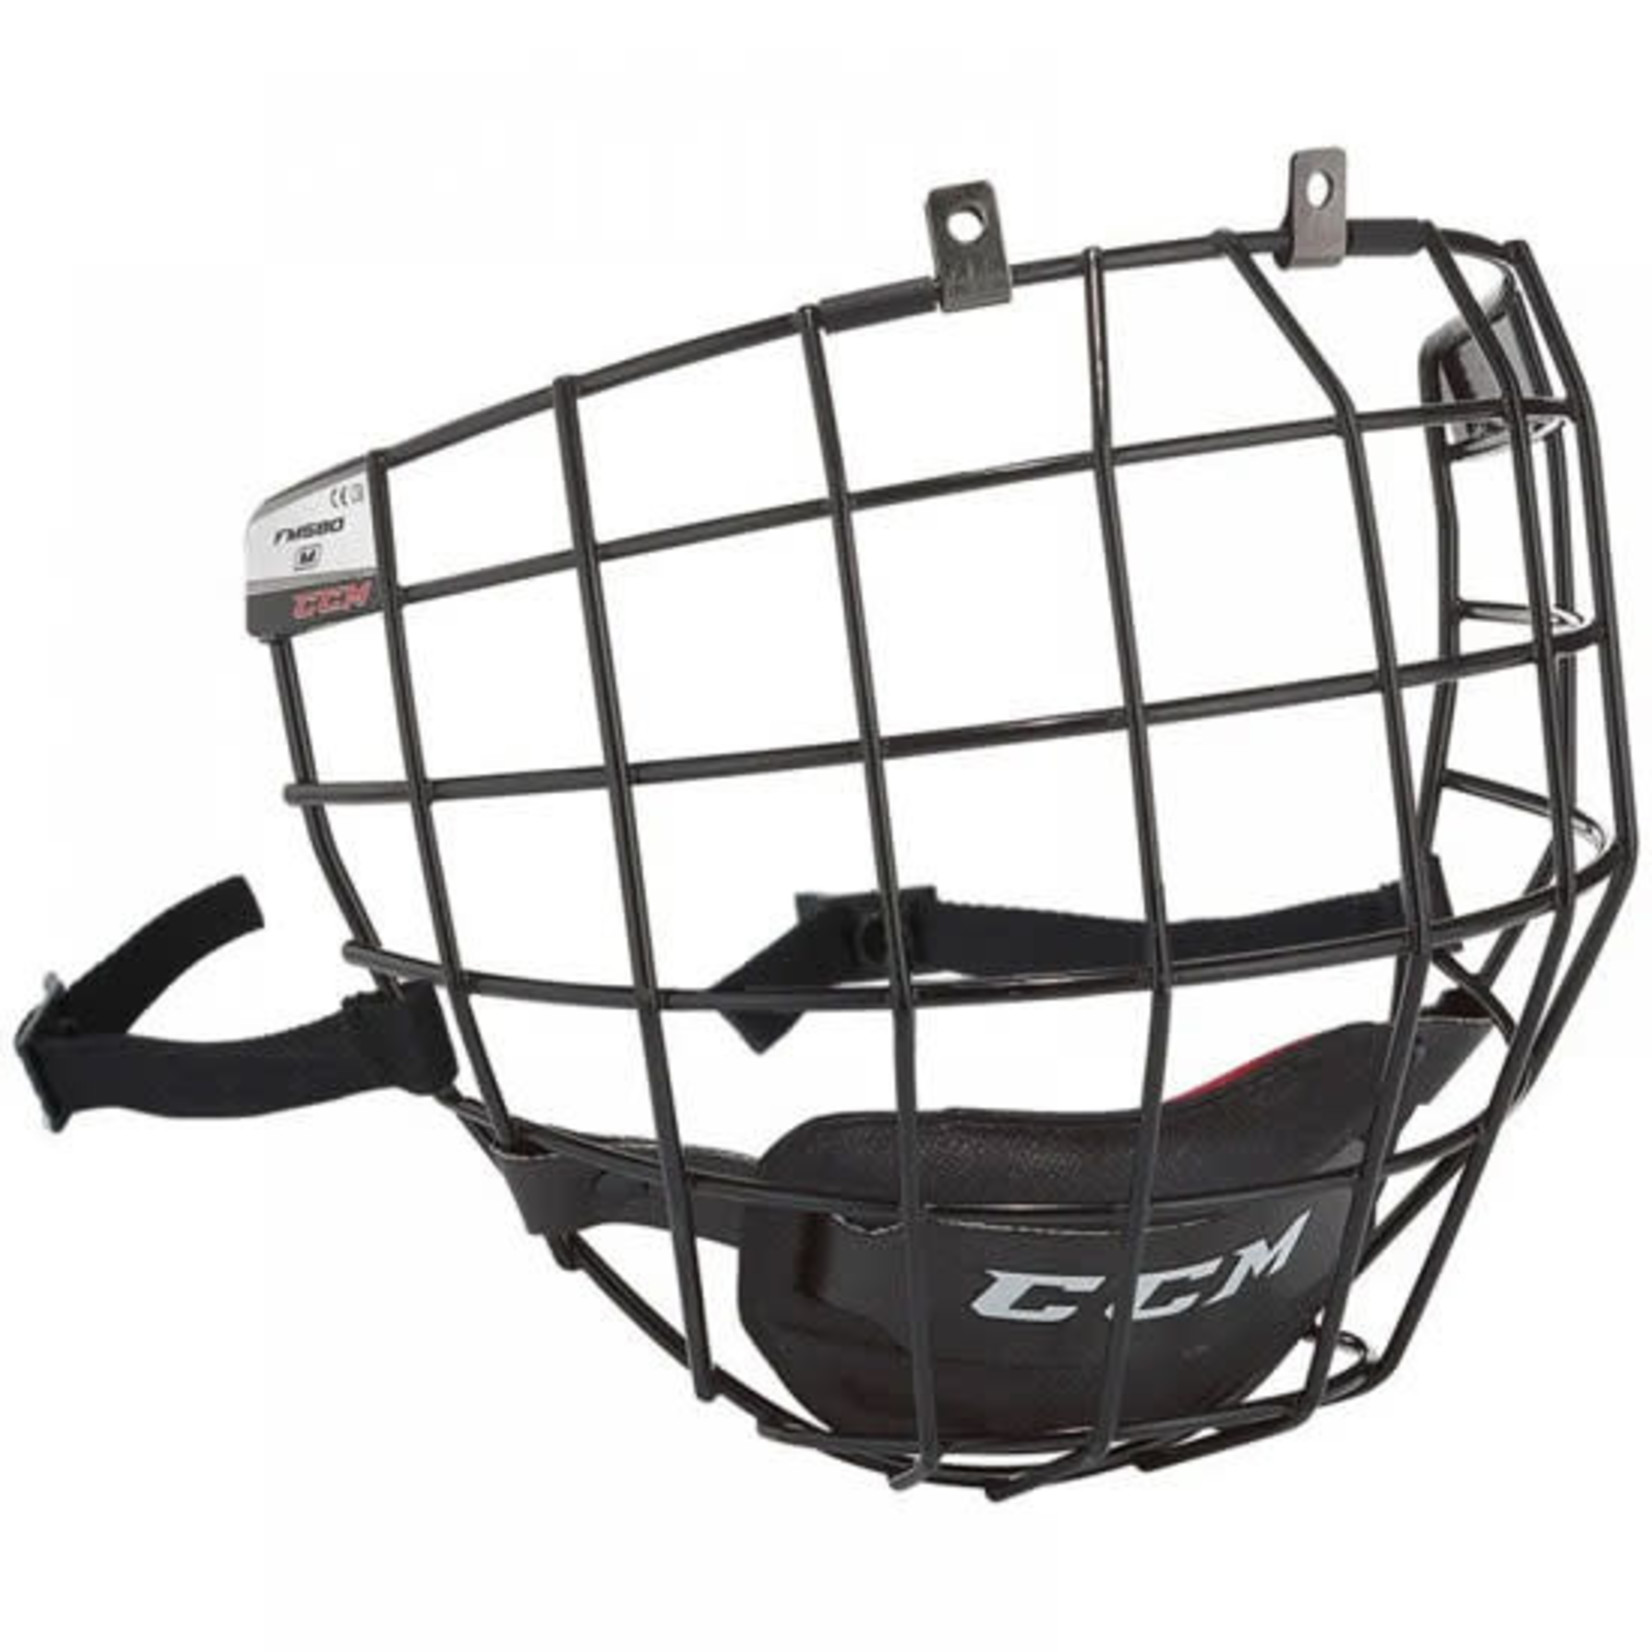 CCM CCM Hockey Facemask, 580, Senior